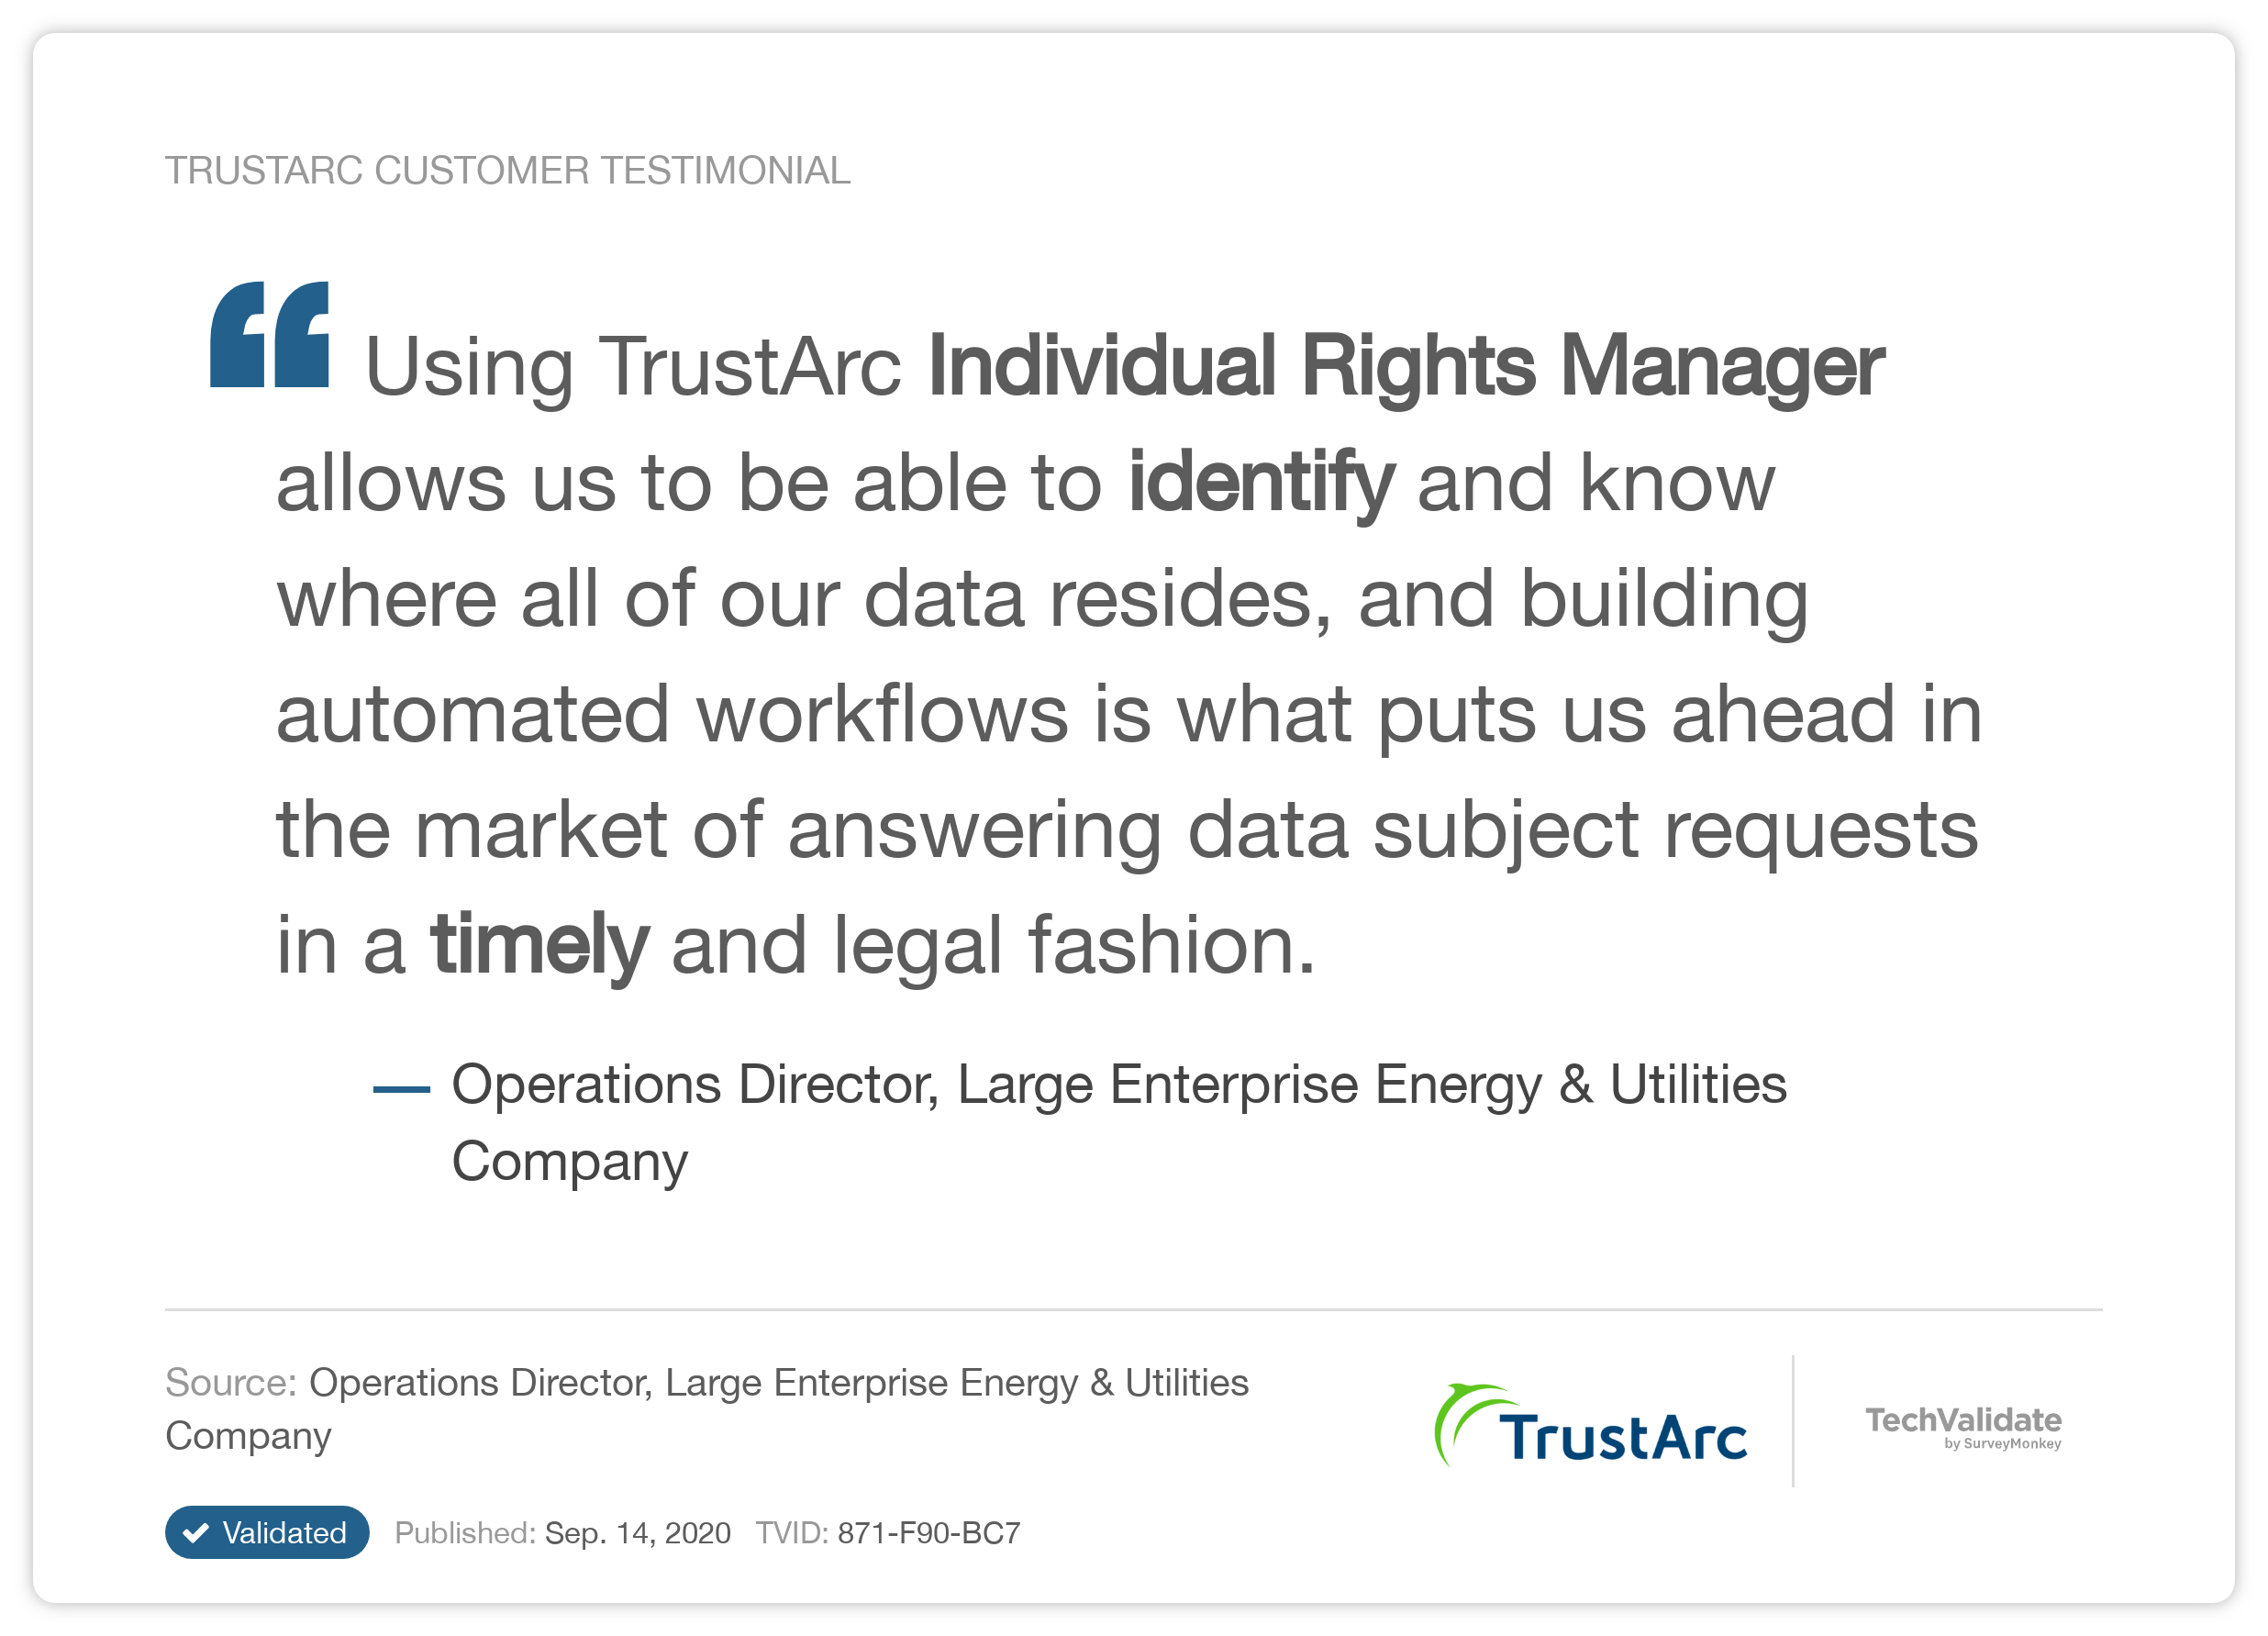 TrustArc DSAR Testimonial